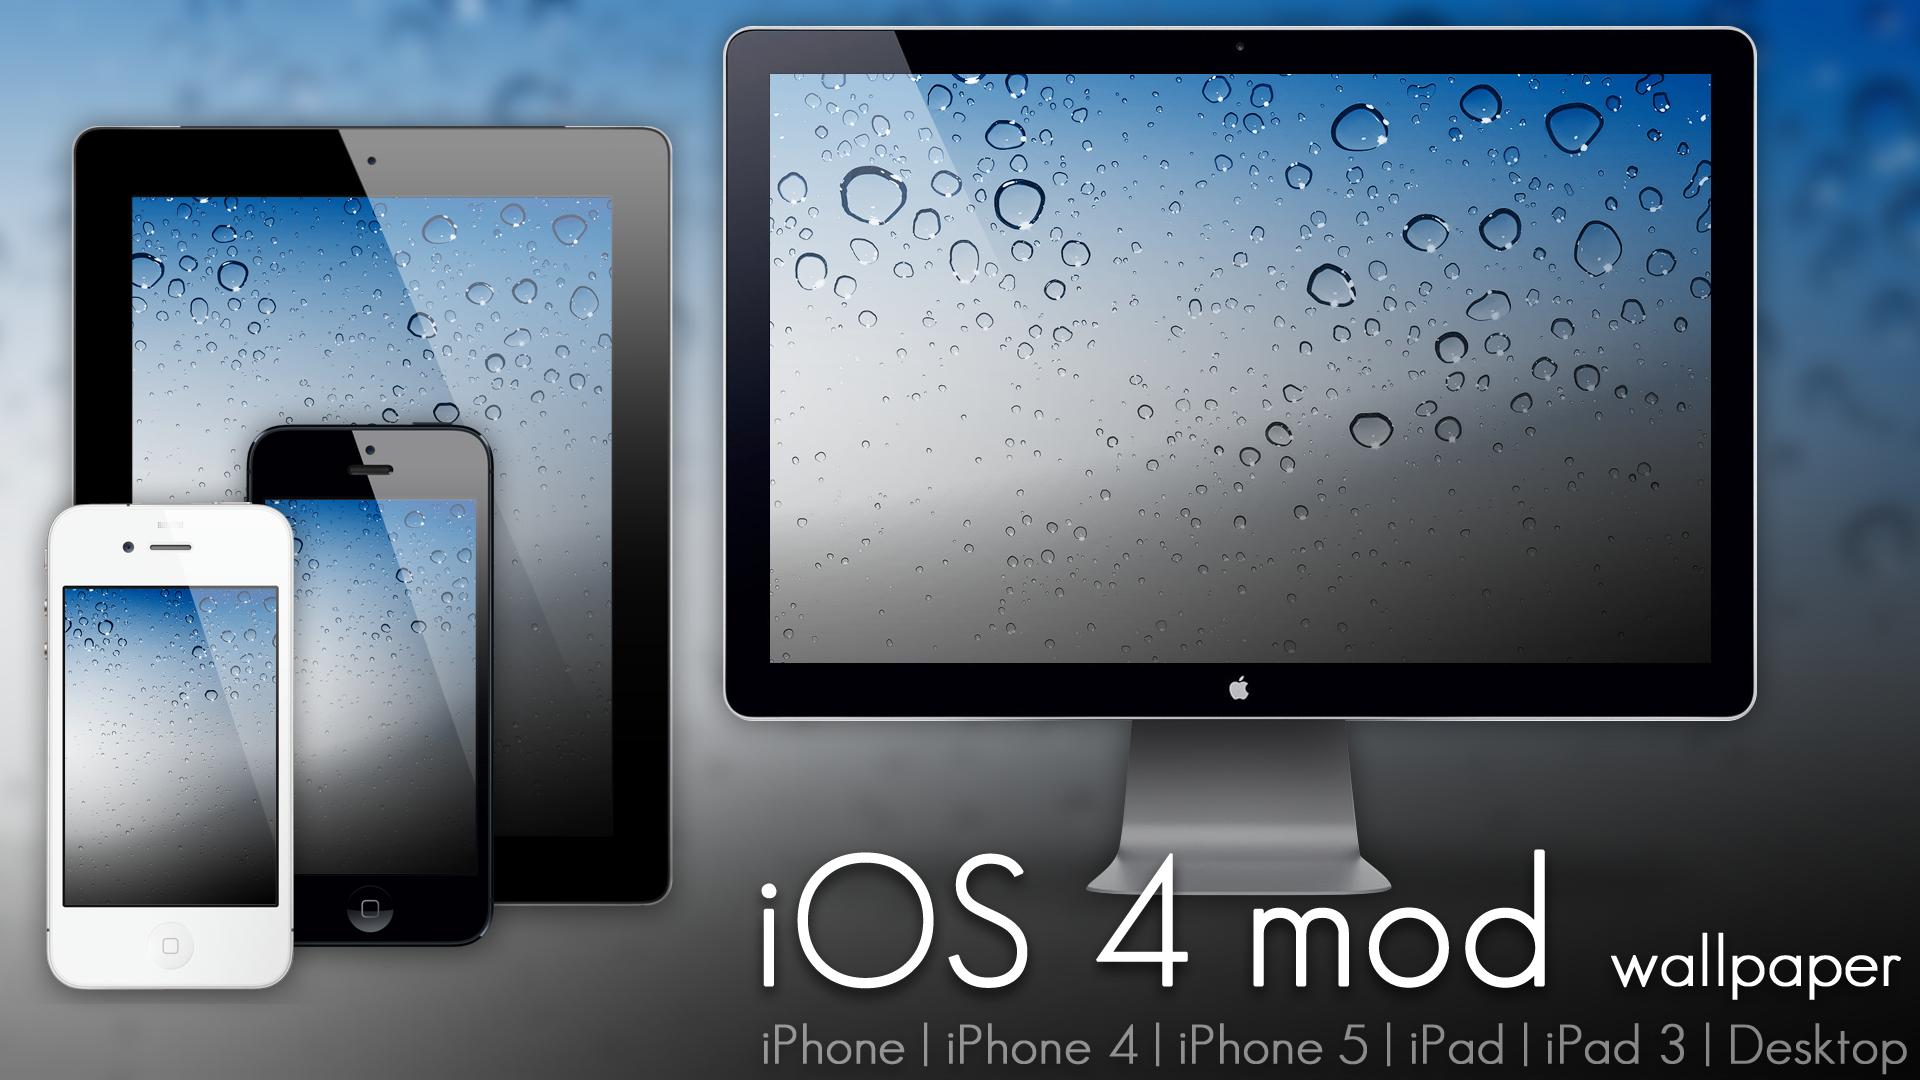 iOS 4 Defualt Wallpaper Mod 2 by datadude3 1920x1080